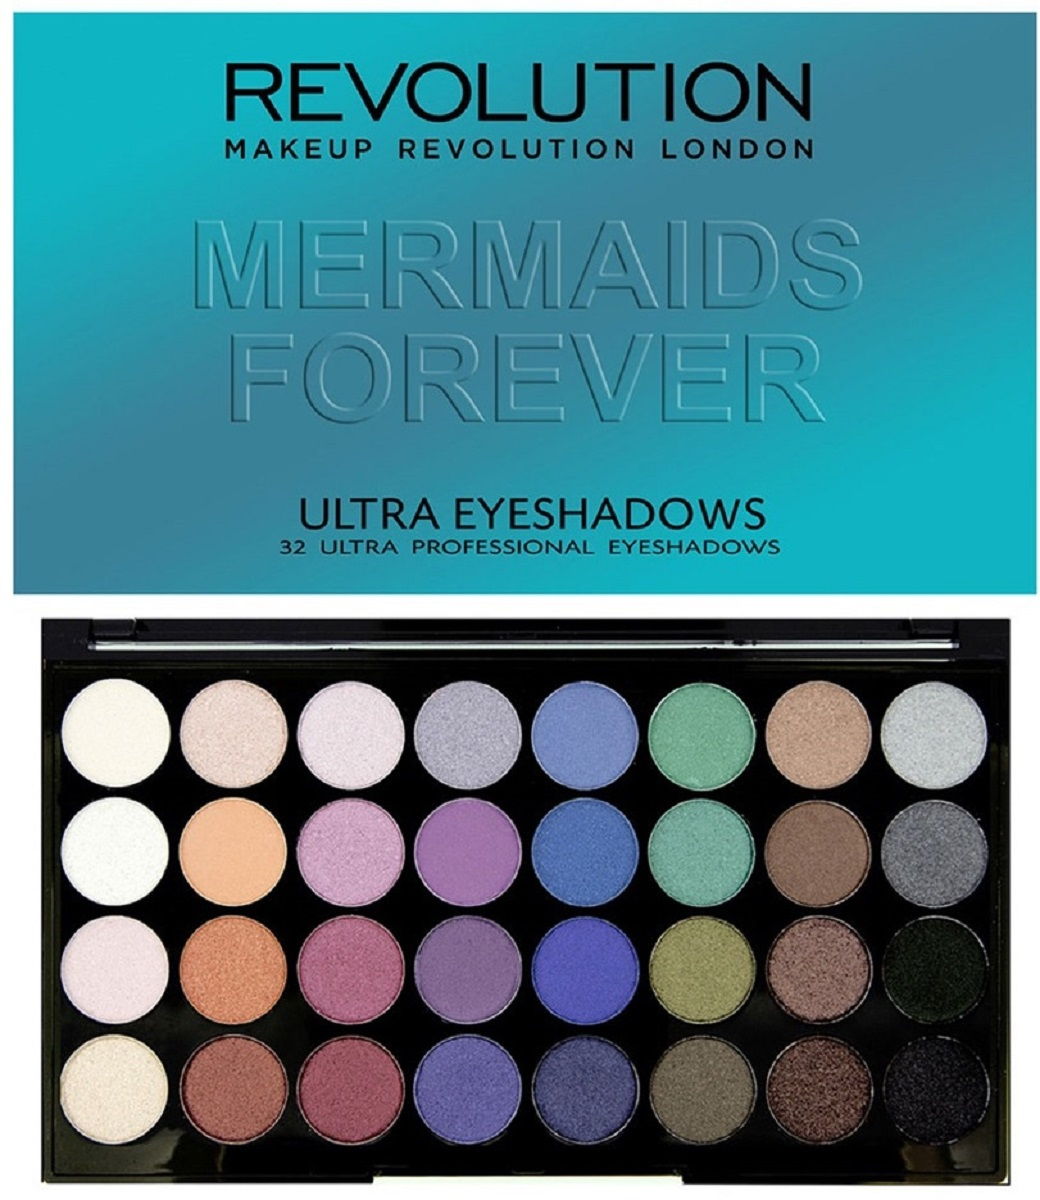 Makeup Revolution Палетка теней 32 Ultra Eyeshadows Mermaids Forever makeup revolution набор из 30 теней 30 eyeshadow palette fortune favours the brave